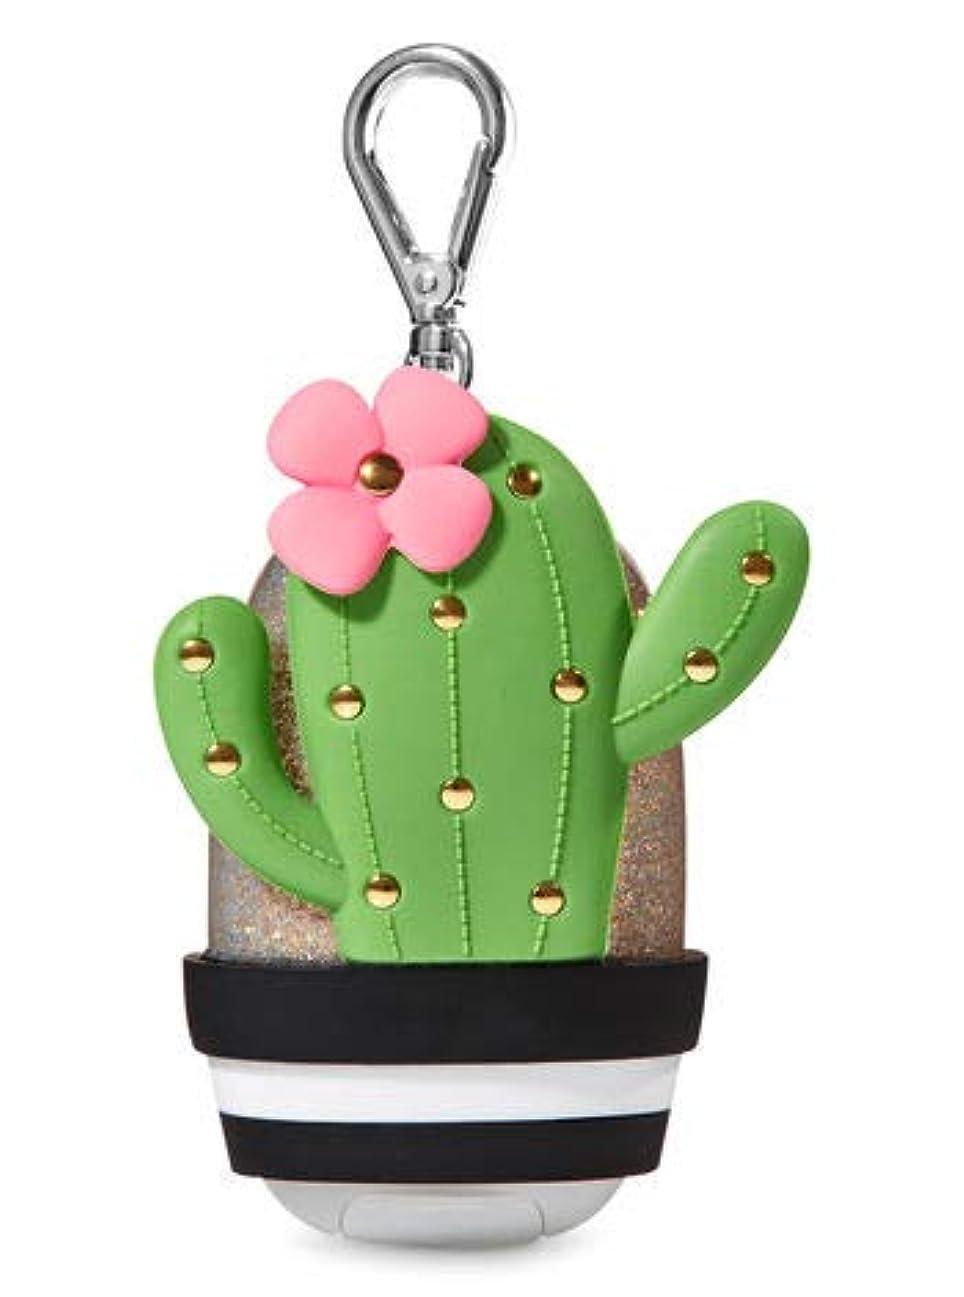 【Bath&Body Works/バス&ボディワークス】 抗菌ハンドジェルホルダー カクタス Pocketbac Holder Cactus [並行輸入品]